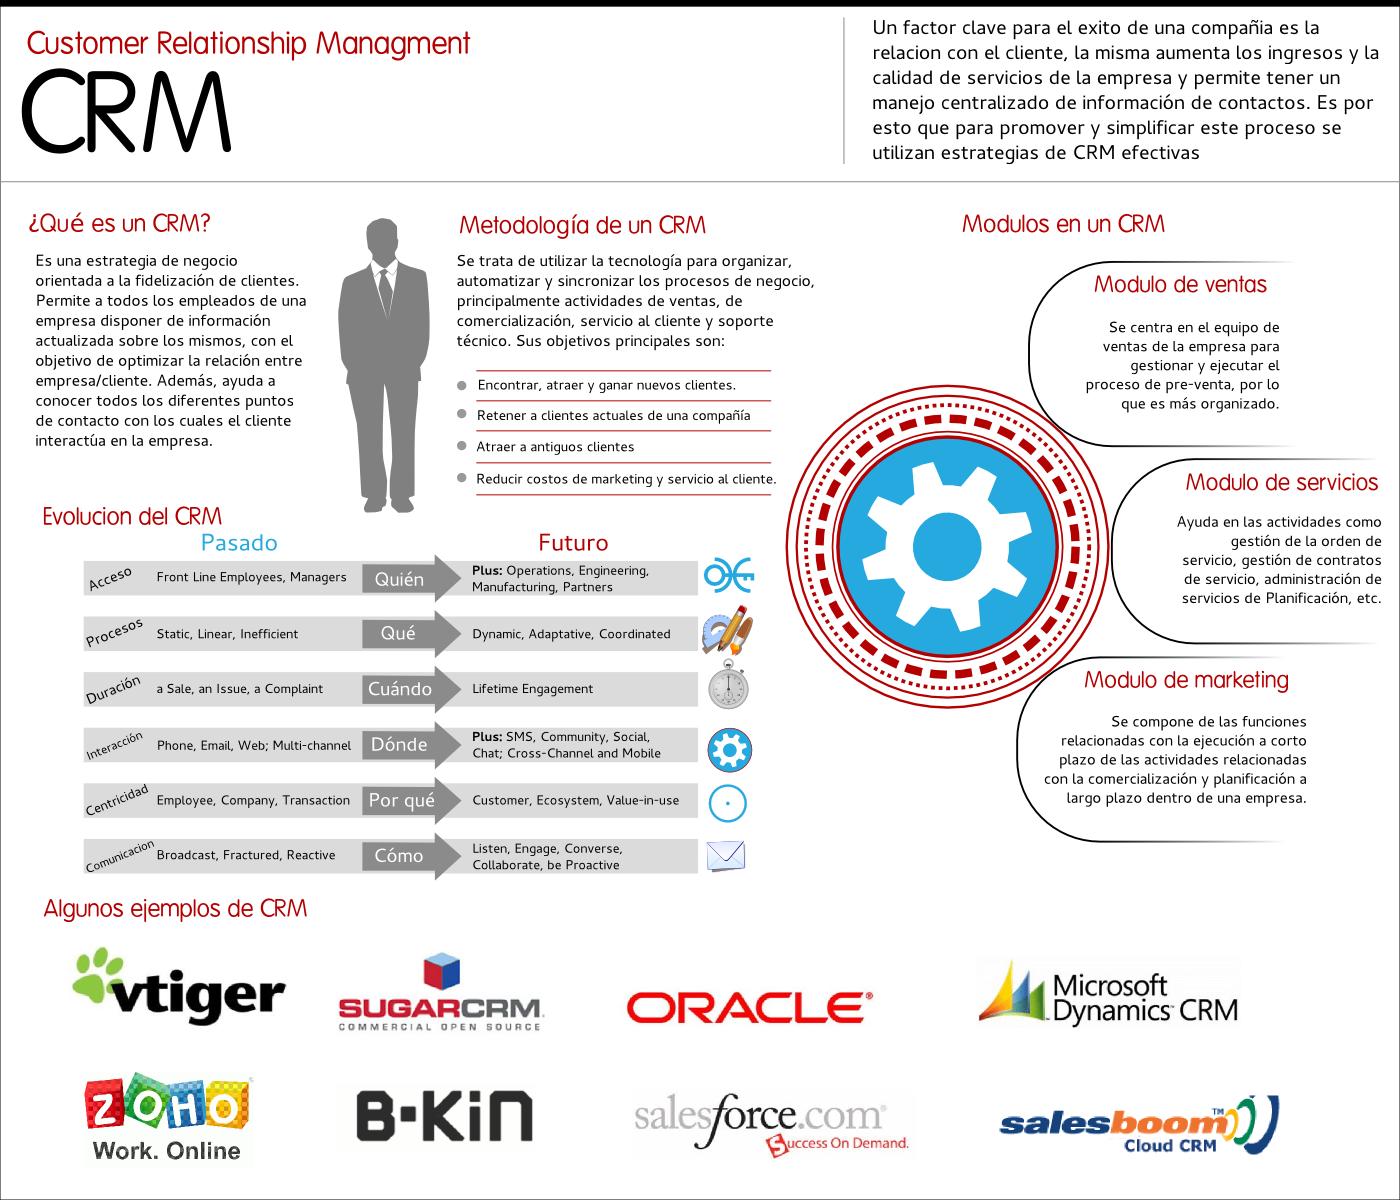 definicion de crm customer relationship management